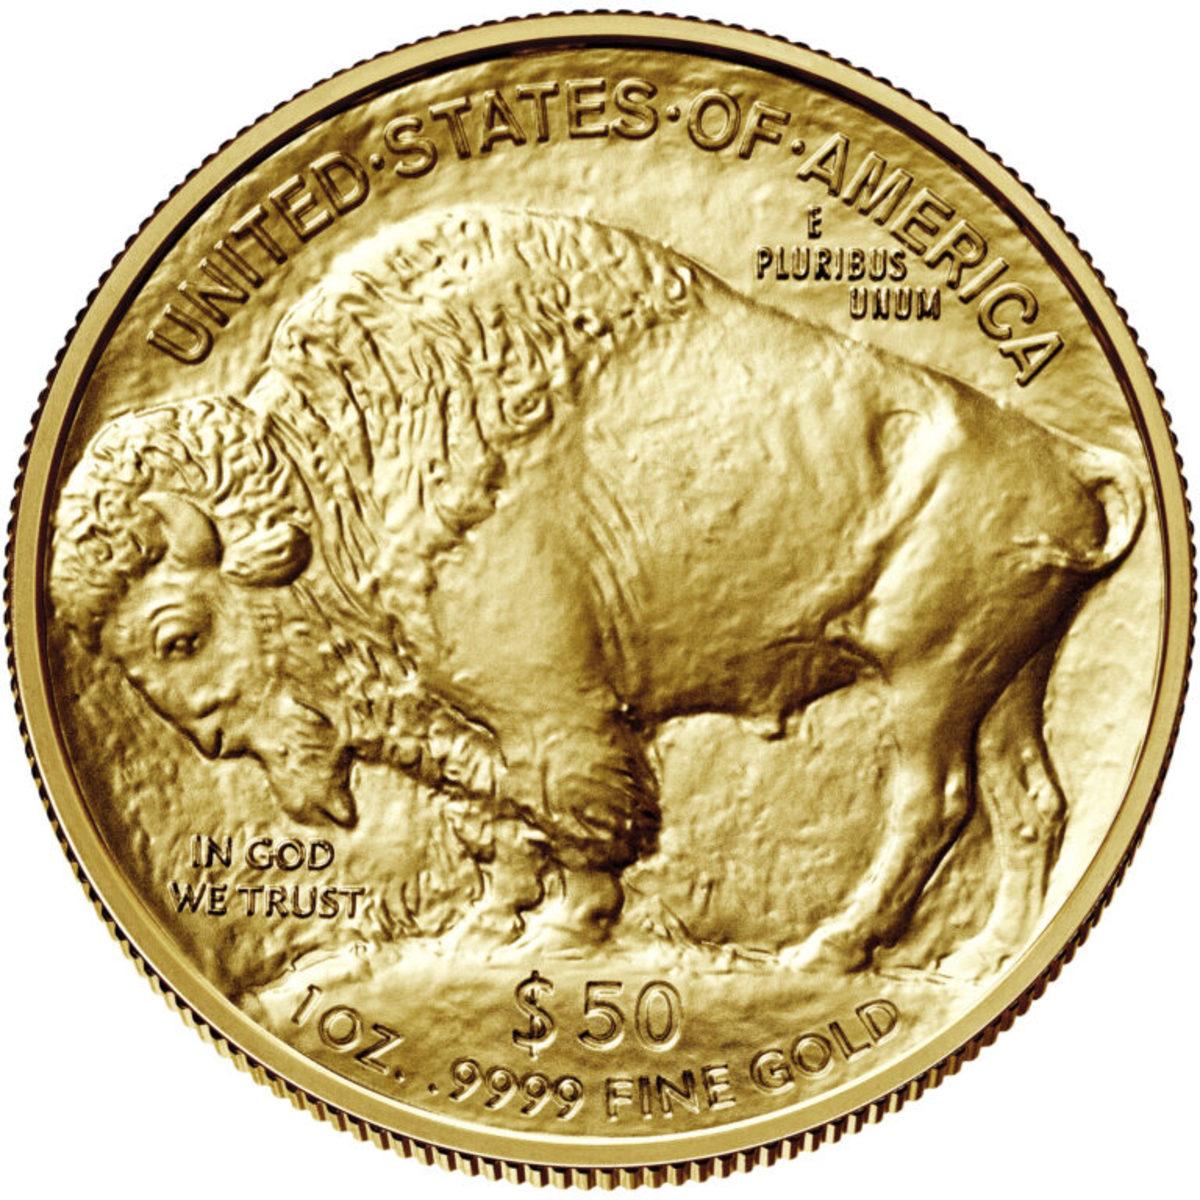 Gold bullion Buffalo coin. (Image courtesy U.S. Mint.)